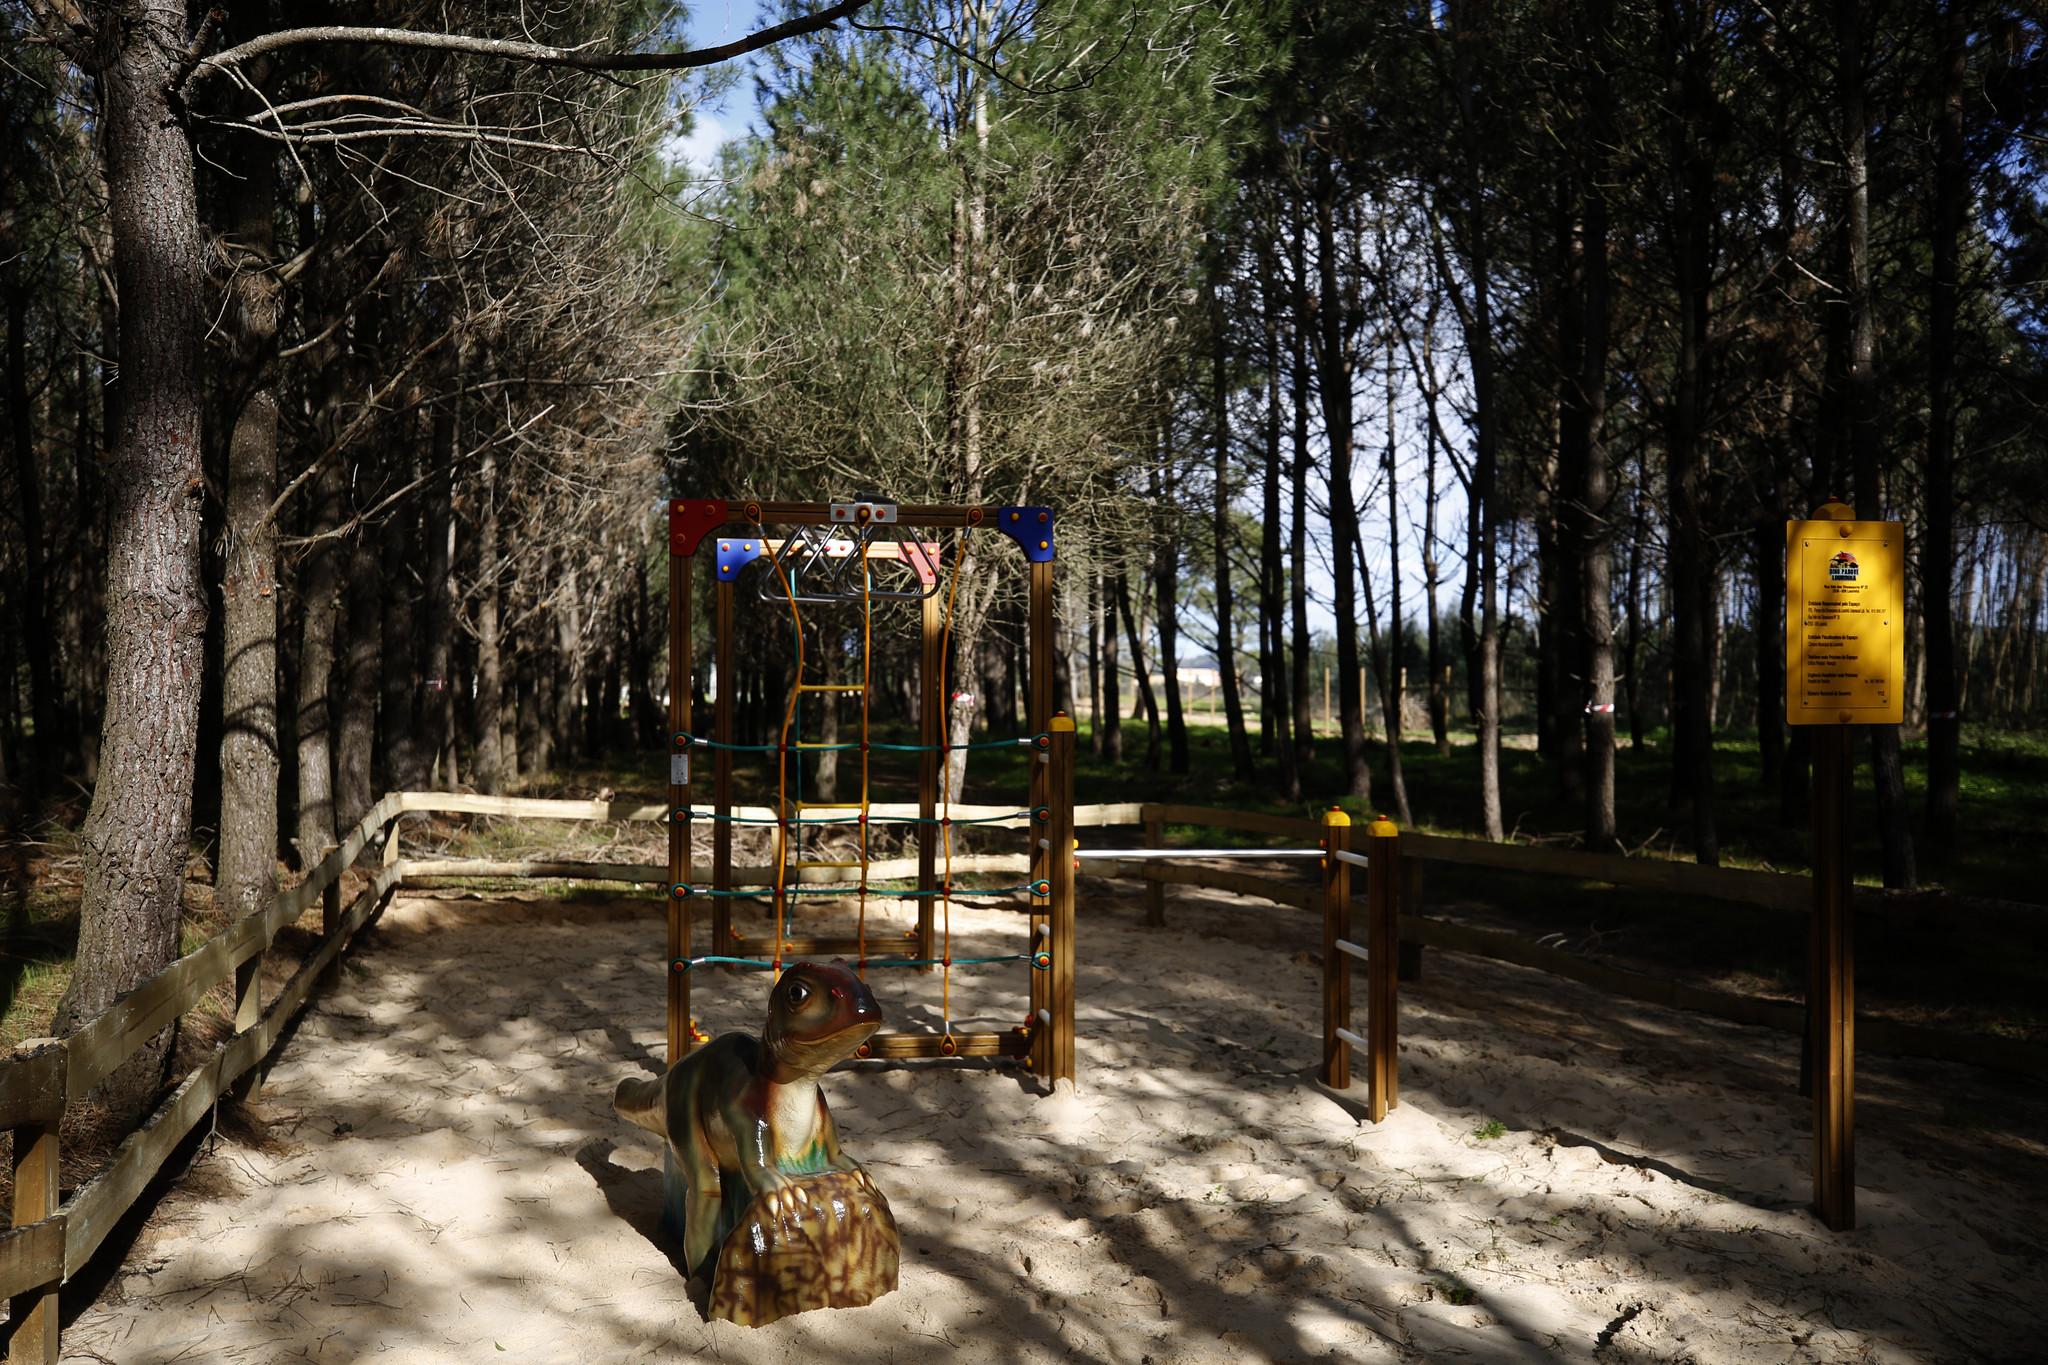 JCC Dino Parque Lourinha 22.JPG